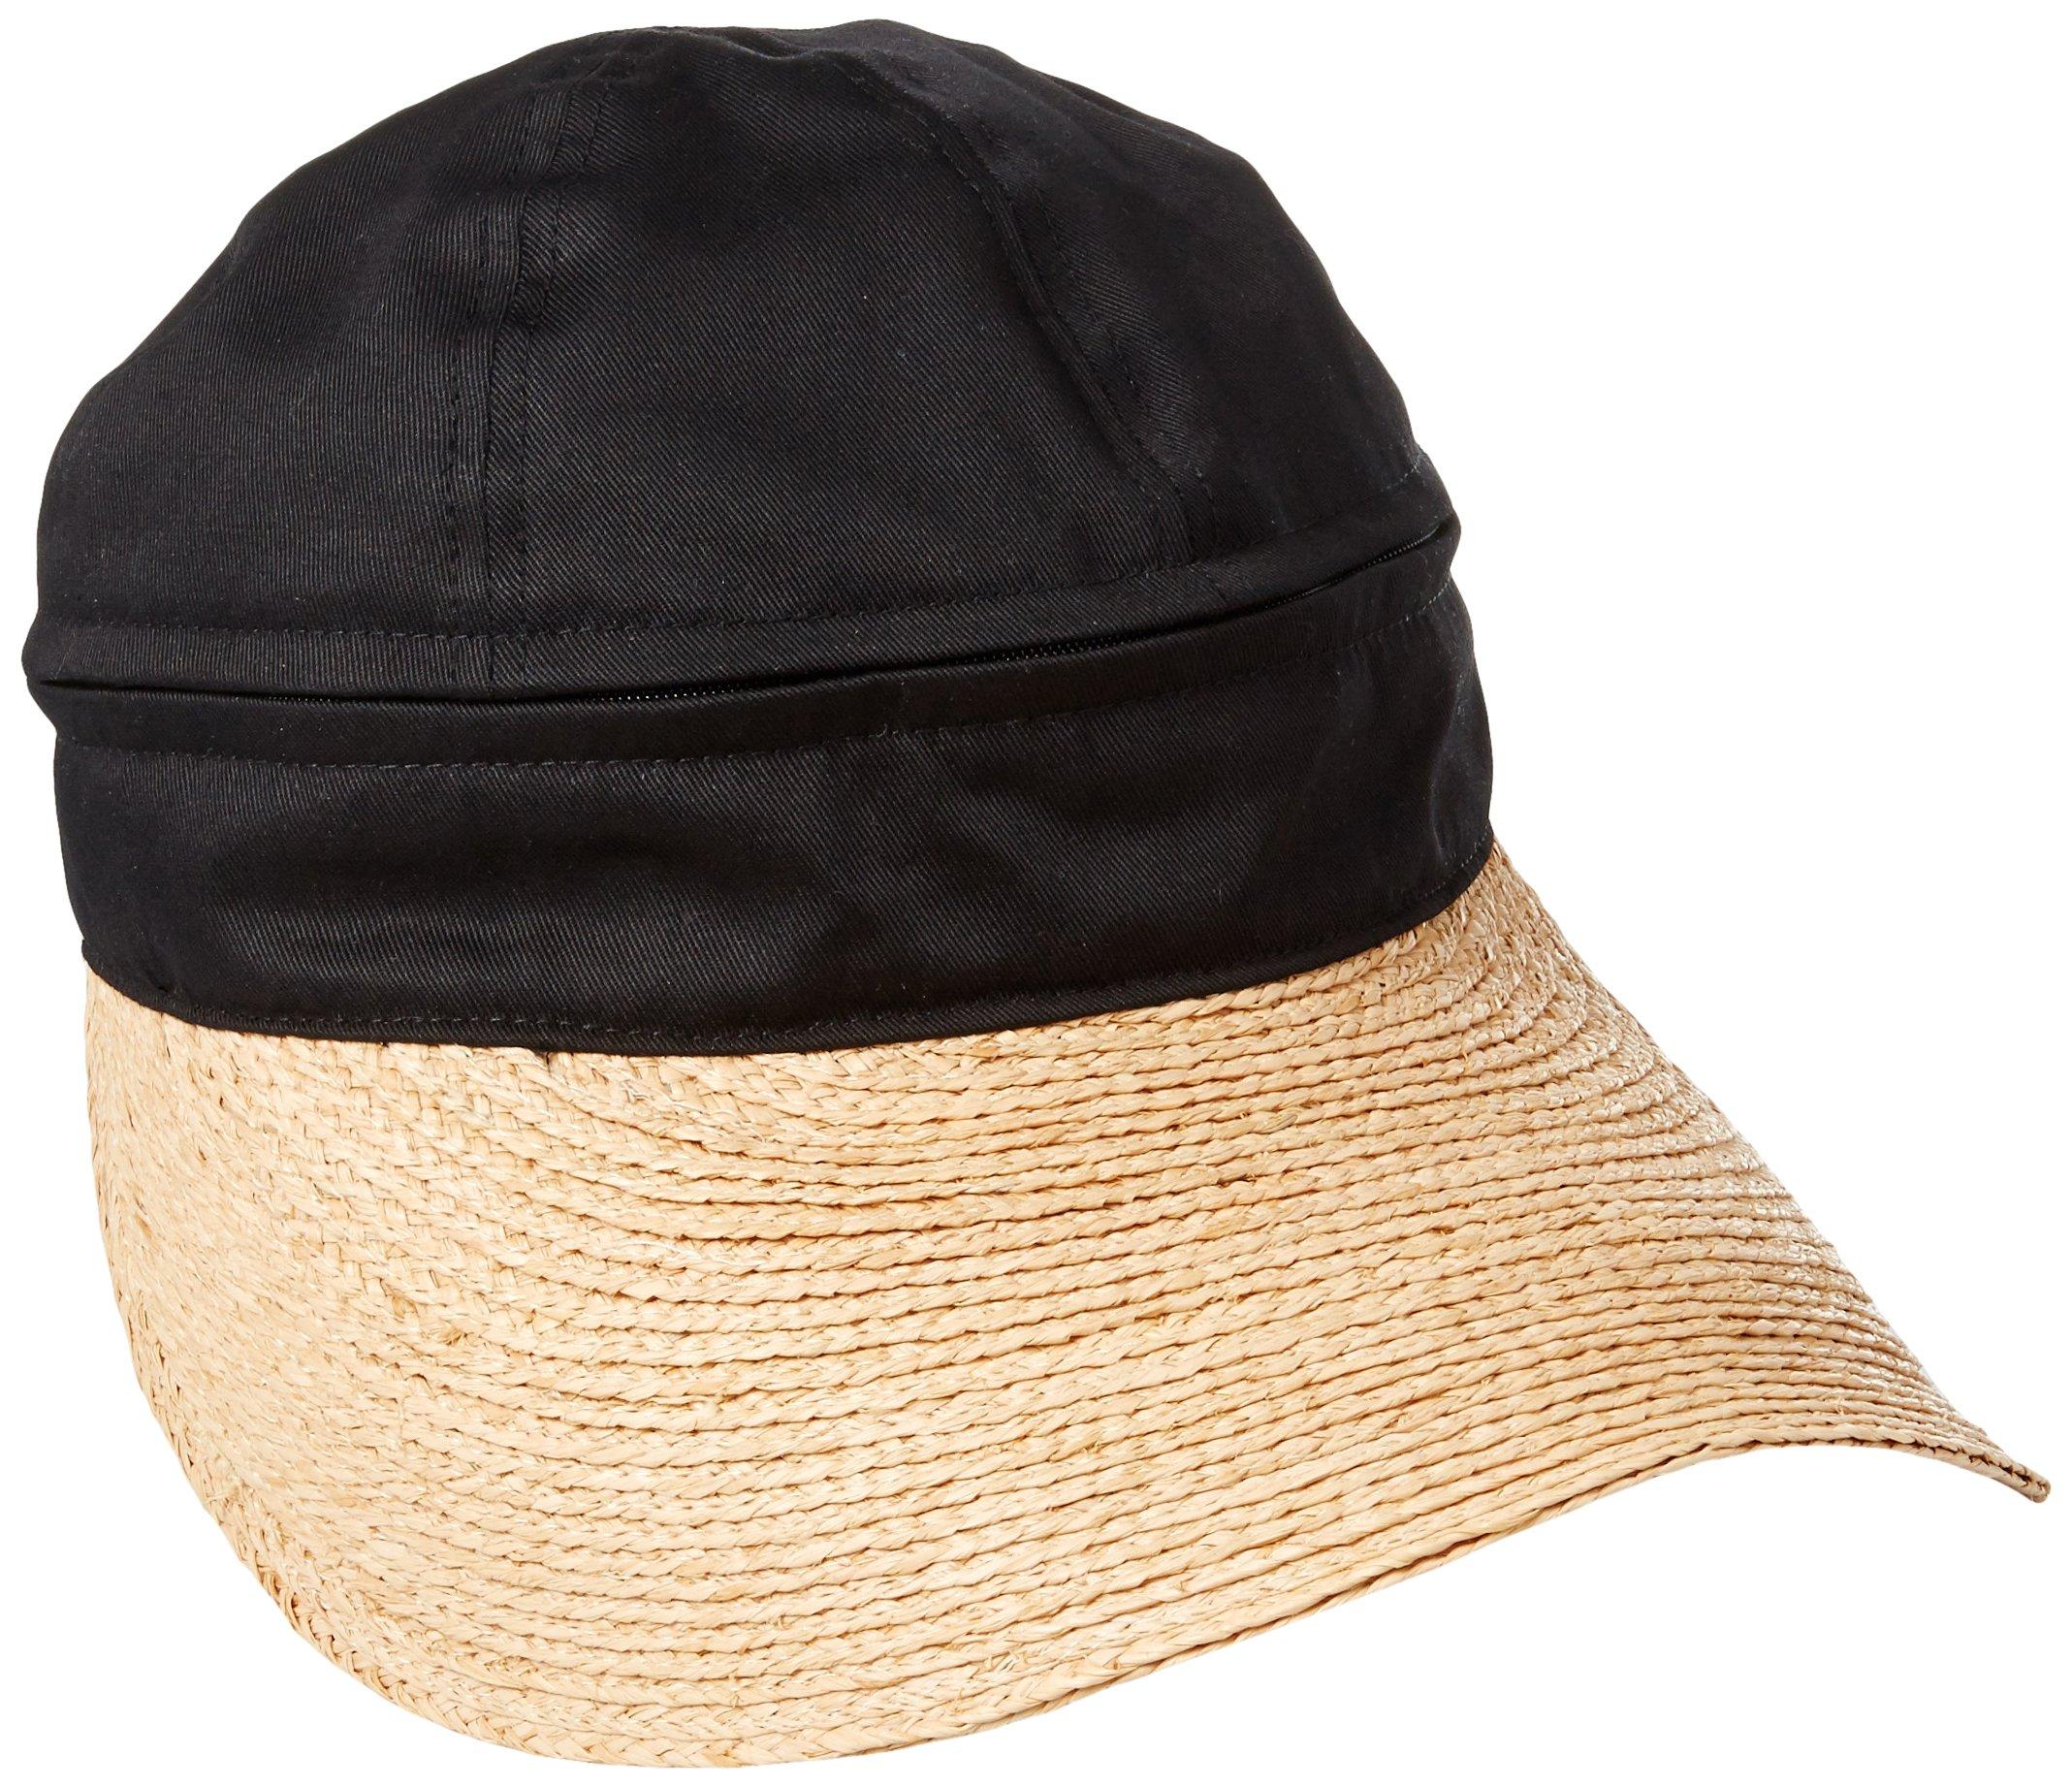 Gottex Women's Regatta Zip Off Crown Convertible Sun Cap With Large Peak Visor, Black, One Size by Gottex